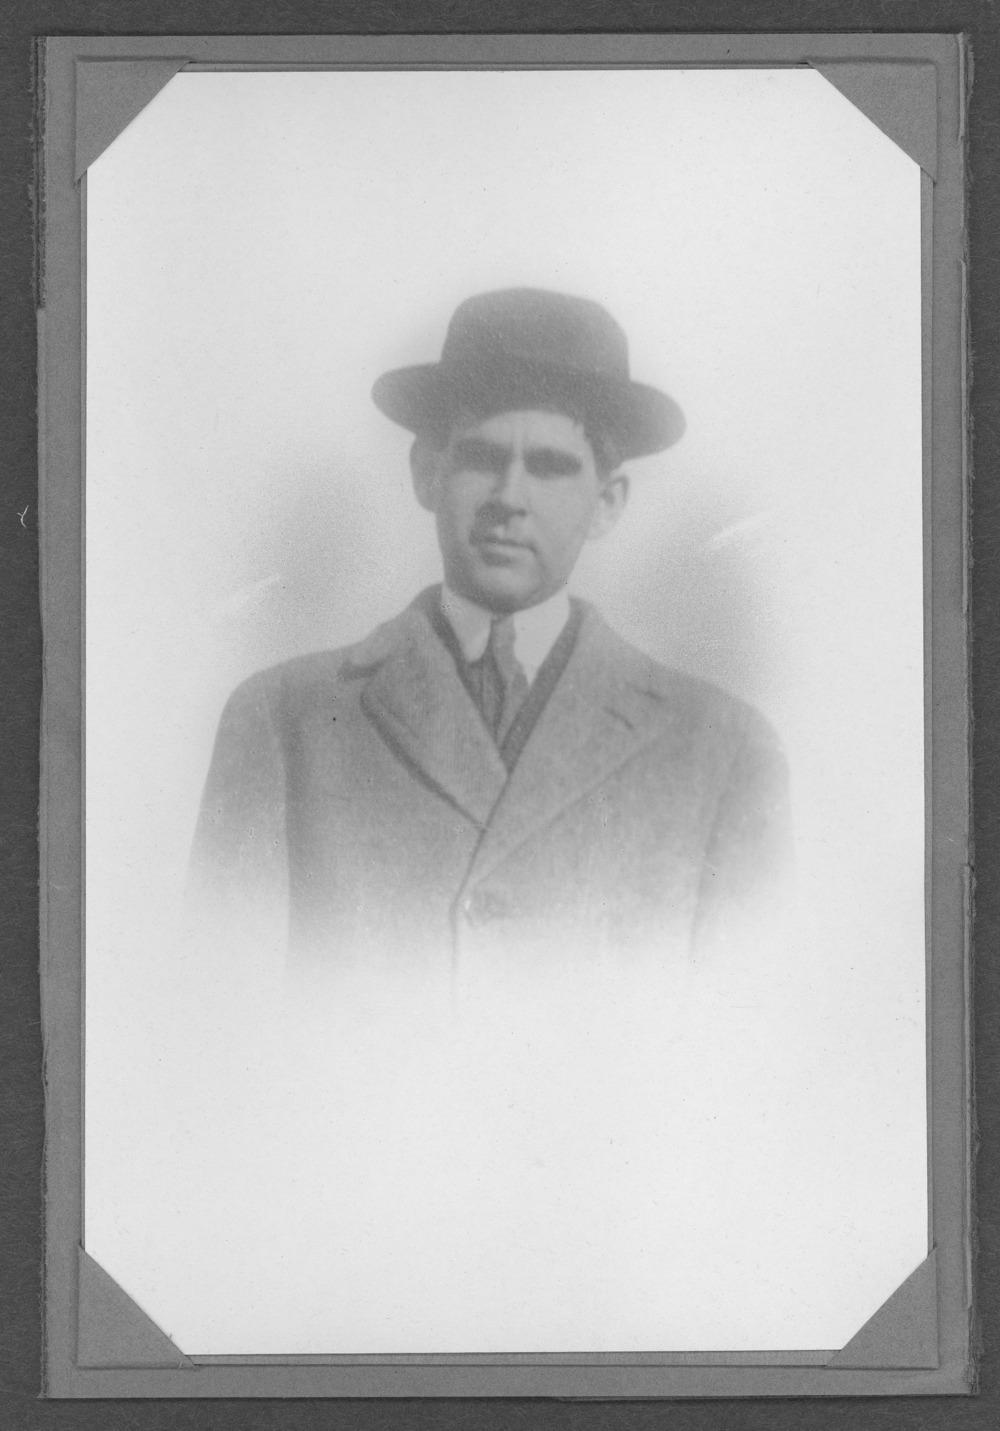 John Tupper, World War I soldier - 3